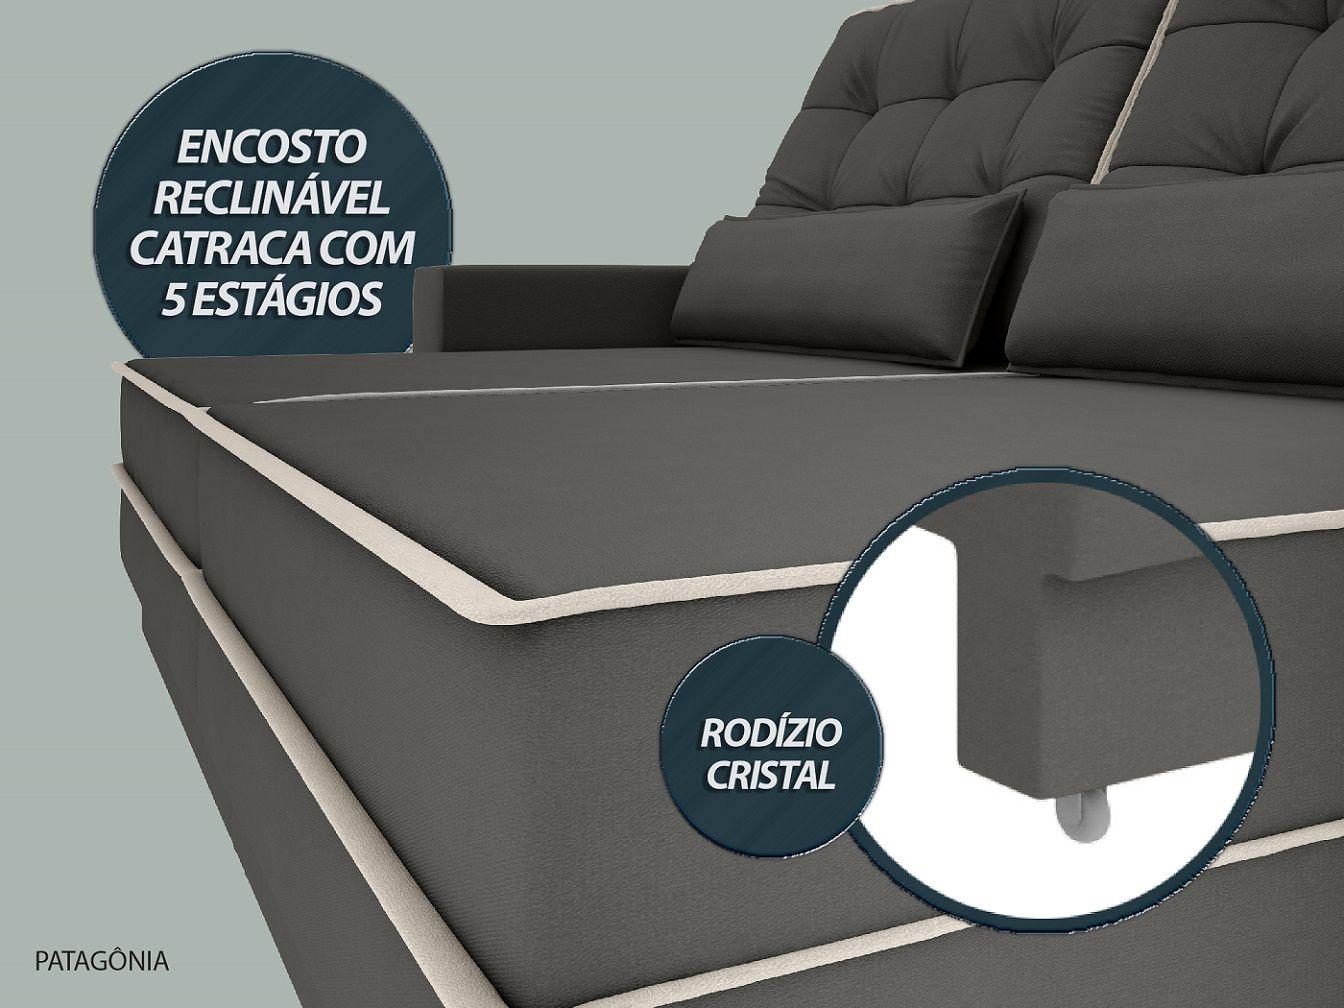 Sofá Patagônia 2,60m Retrátil e Reclinável Velosuede Cinza - NETSOFAS